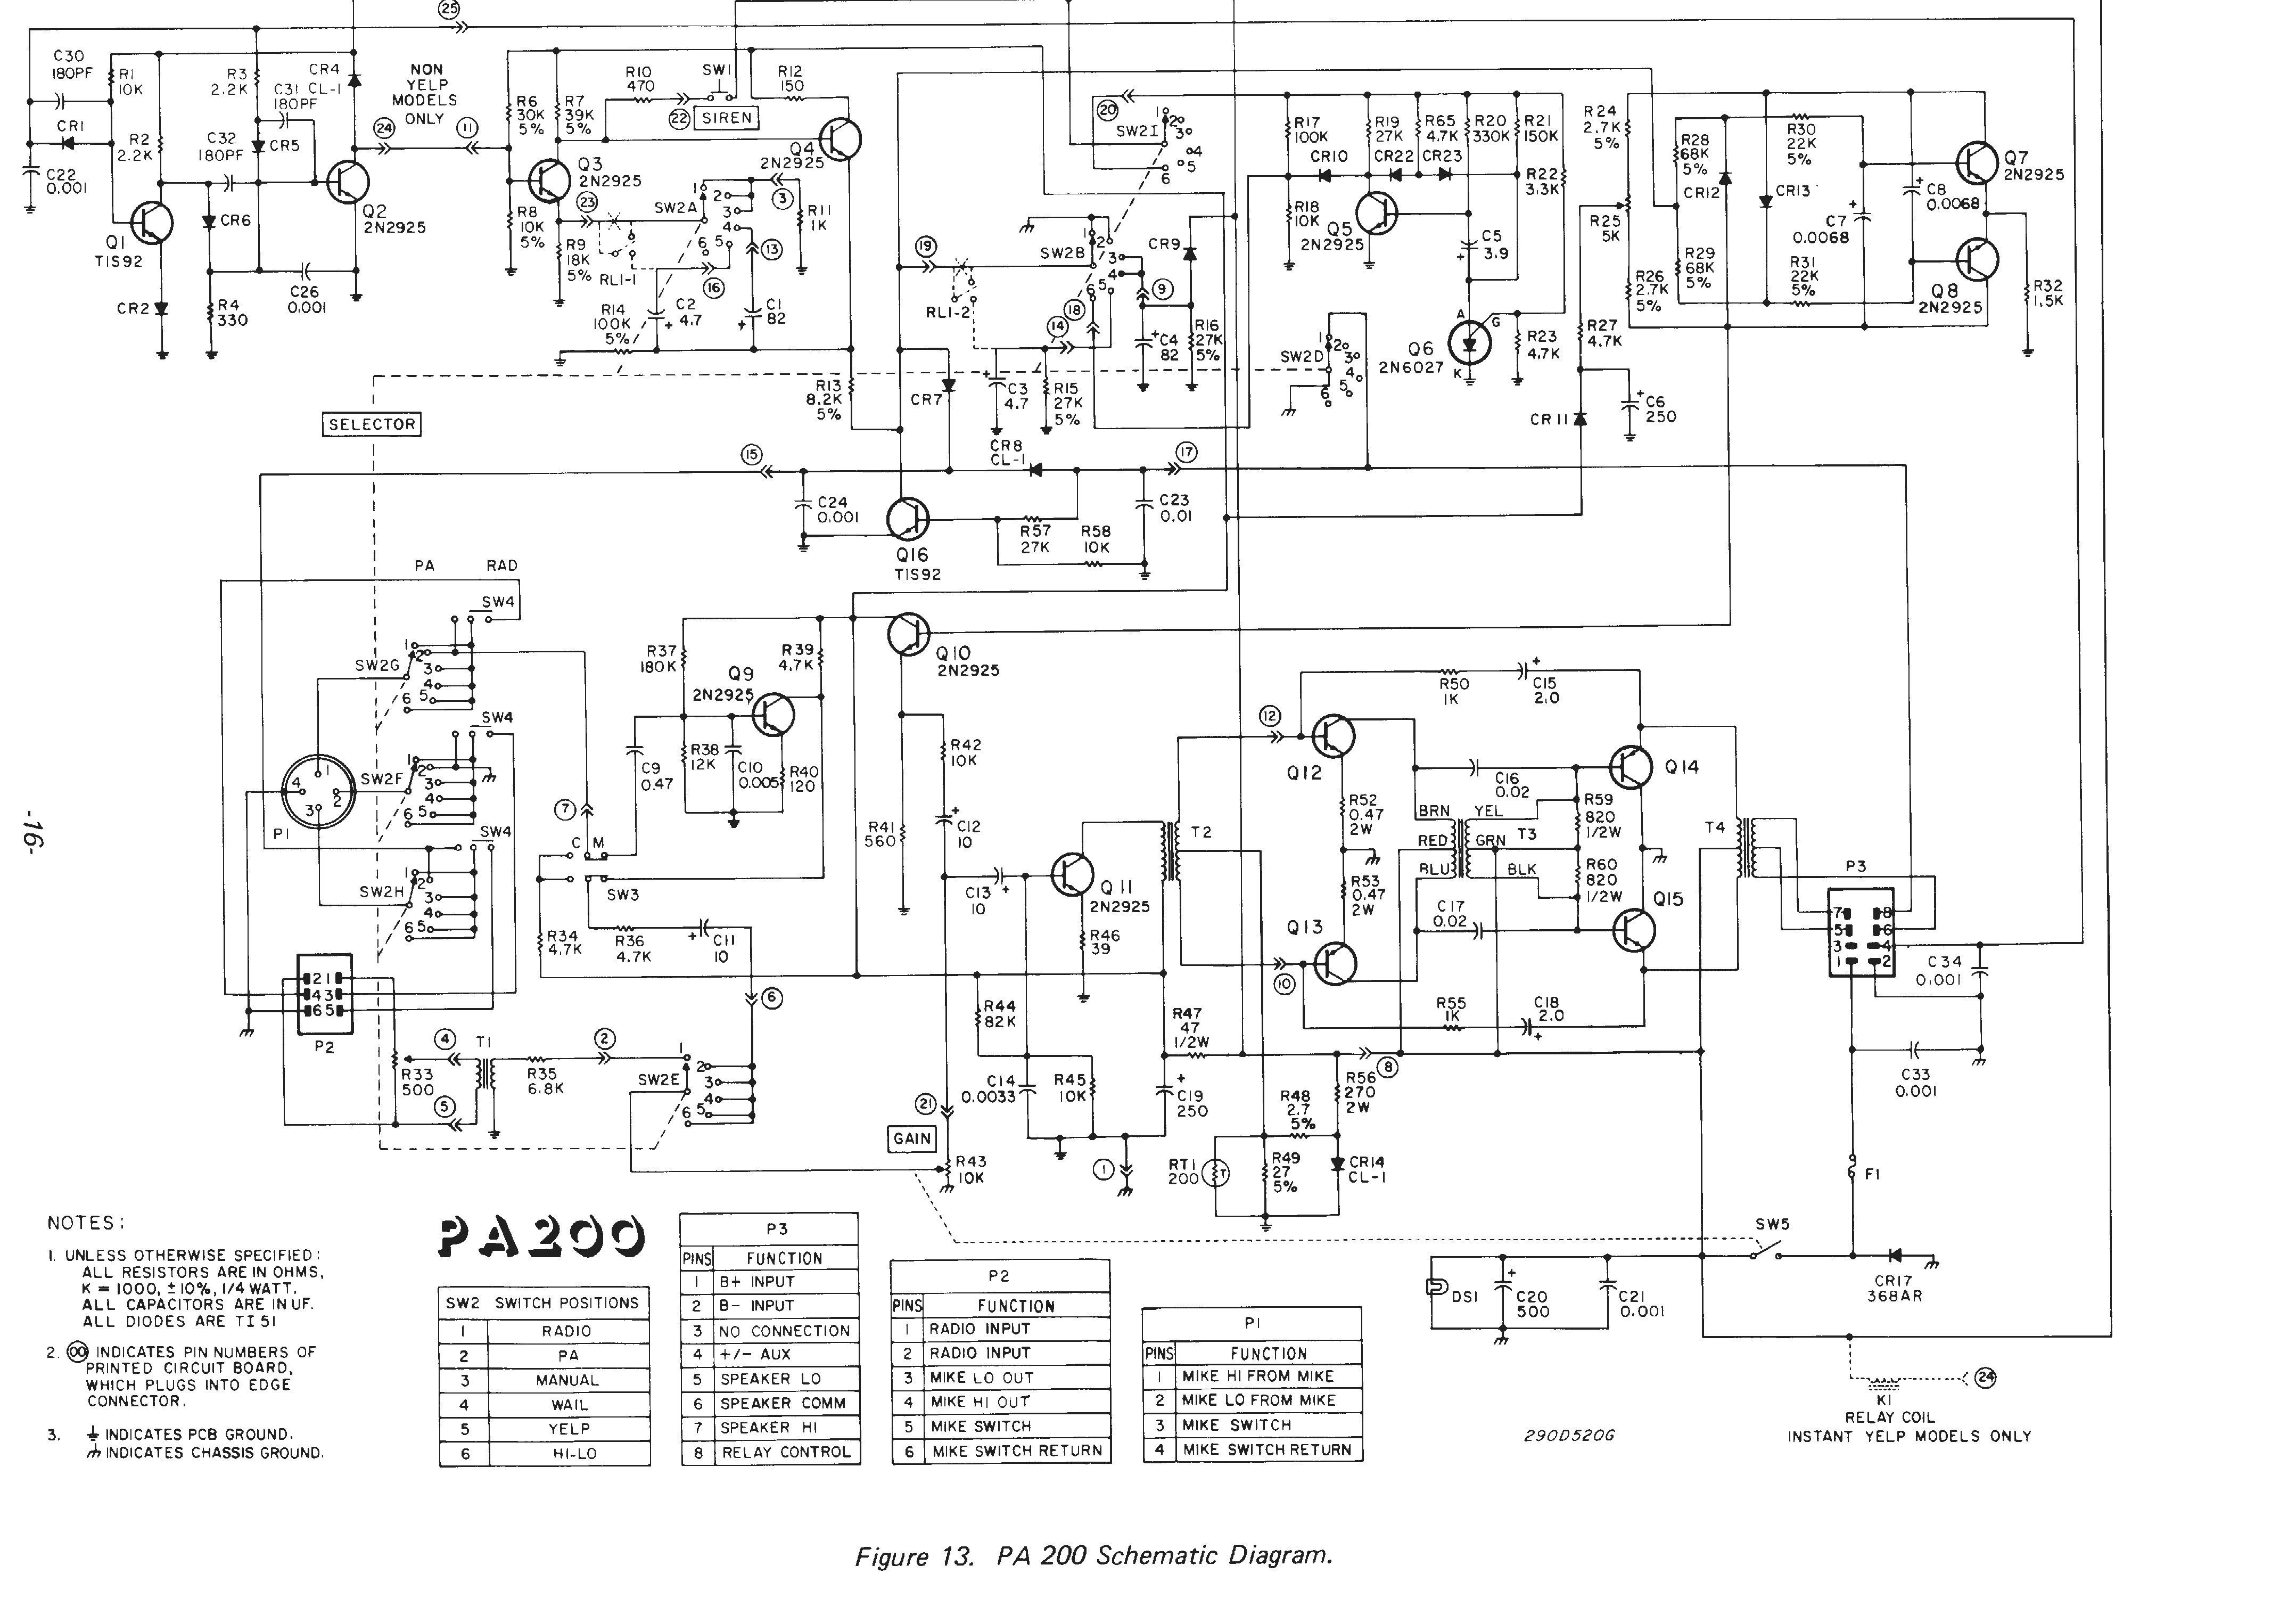 Federal Signal Pa300 Wiring Diagram - Callingallquestions - Federal Signal Pa300 Wiring Diagram